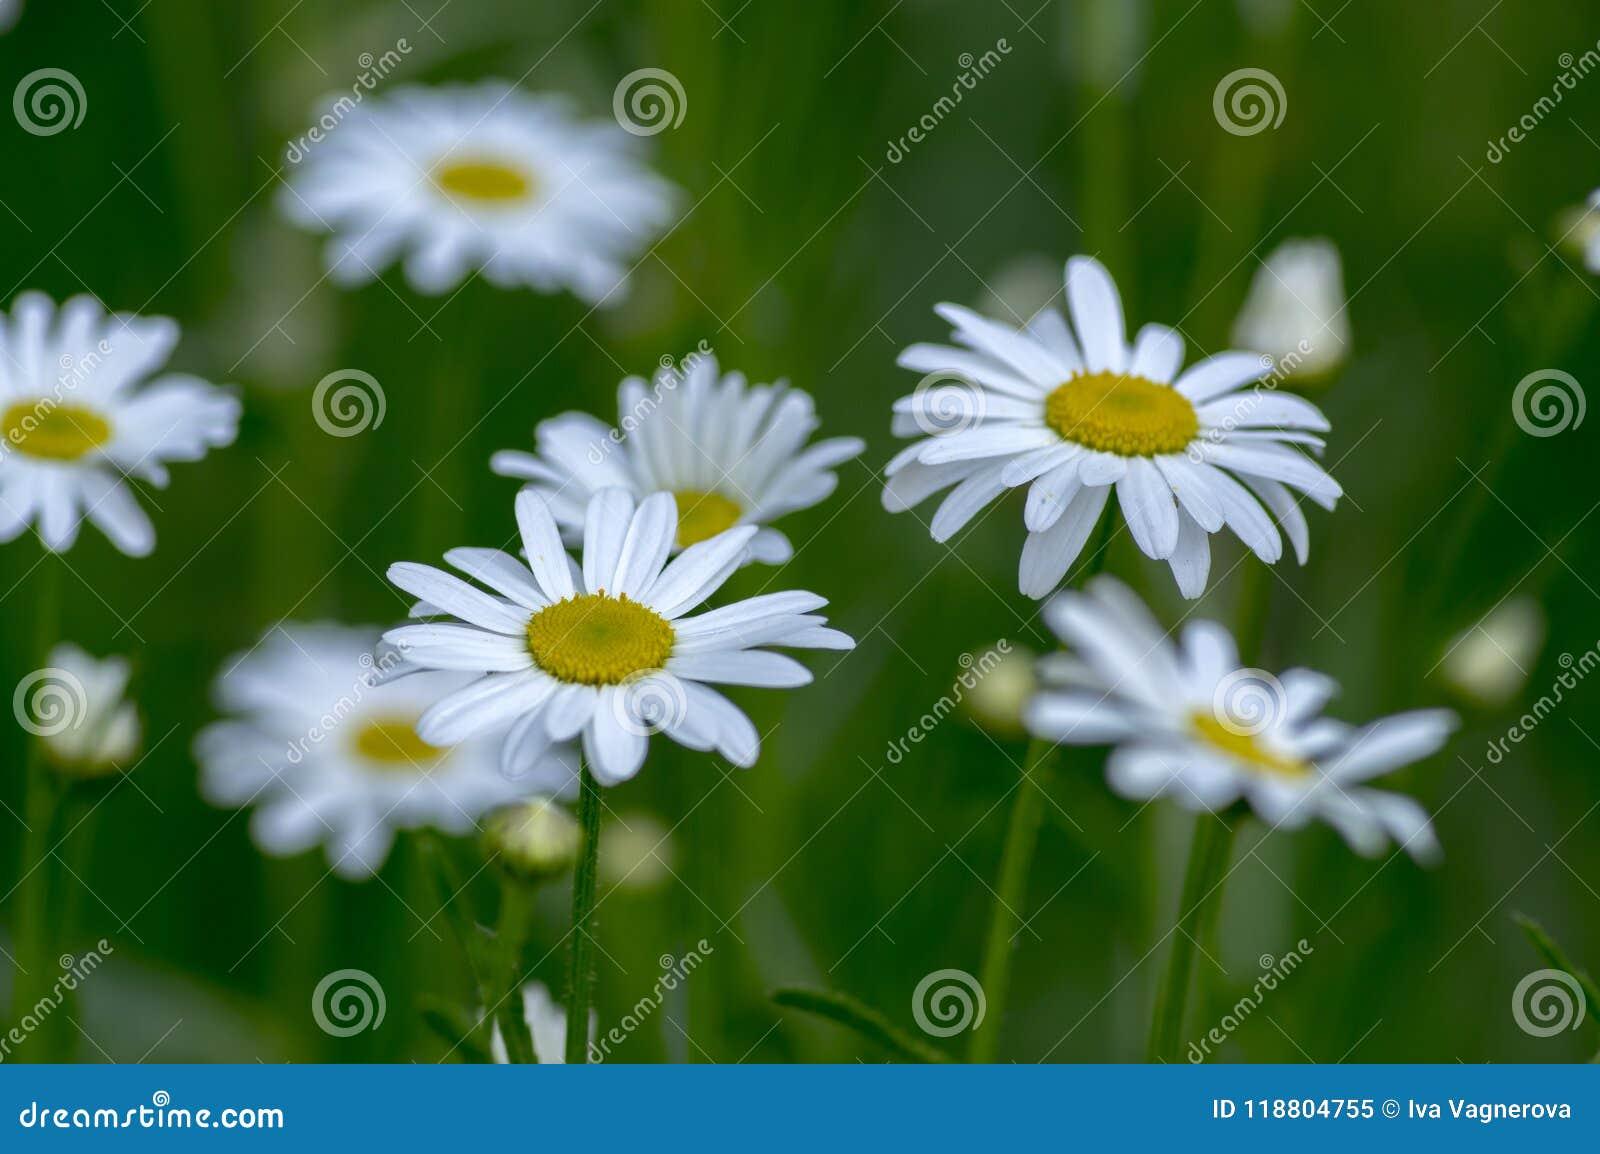 Leucanthemum vulgare meadows wild flowers with white petals and download leucanthemum vulgare meadows wild flowers with white petals and yellow center in bloom stock image mightylinksfo